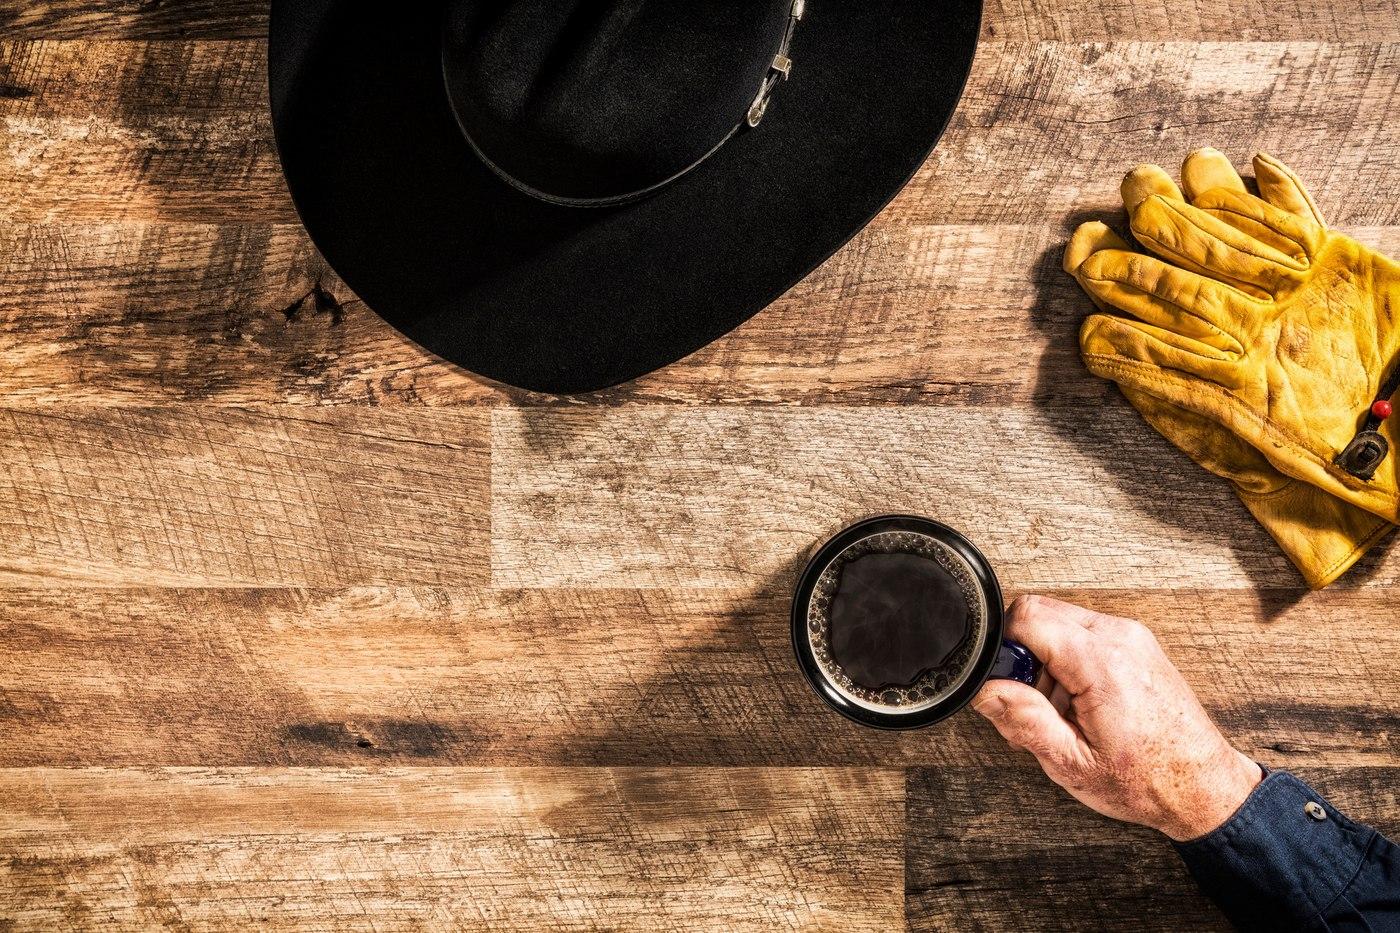 Takeaways from Black Hat USA 2018